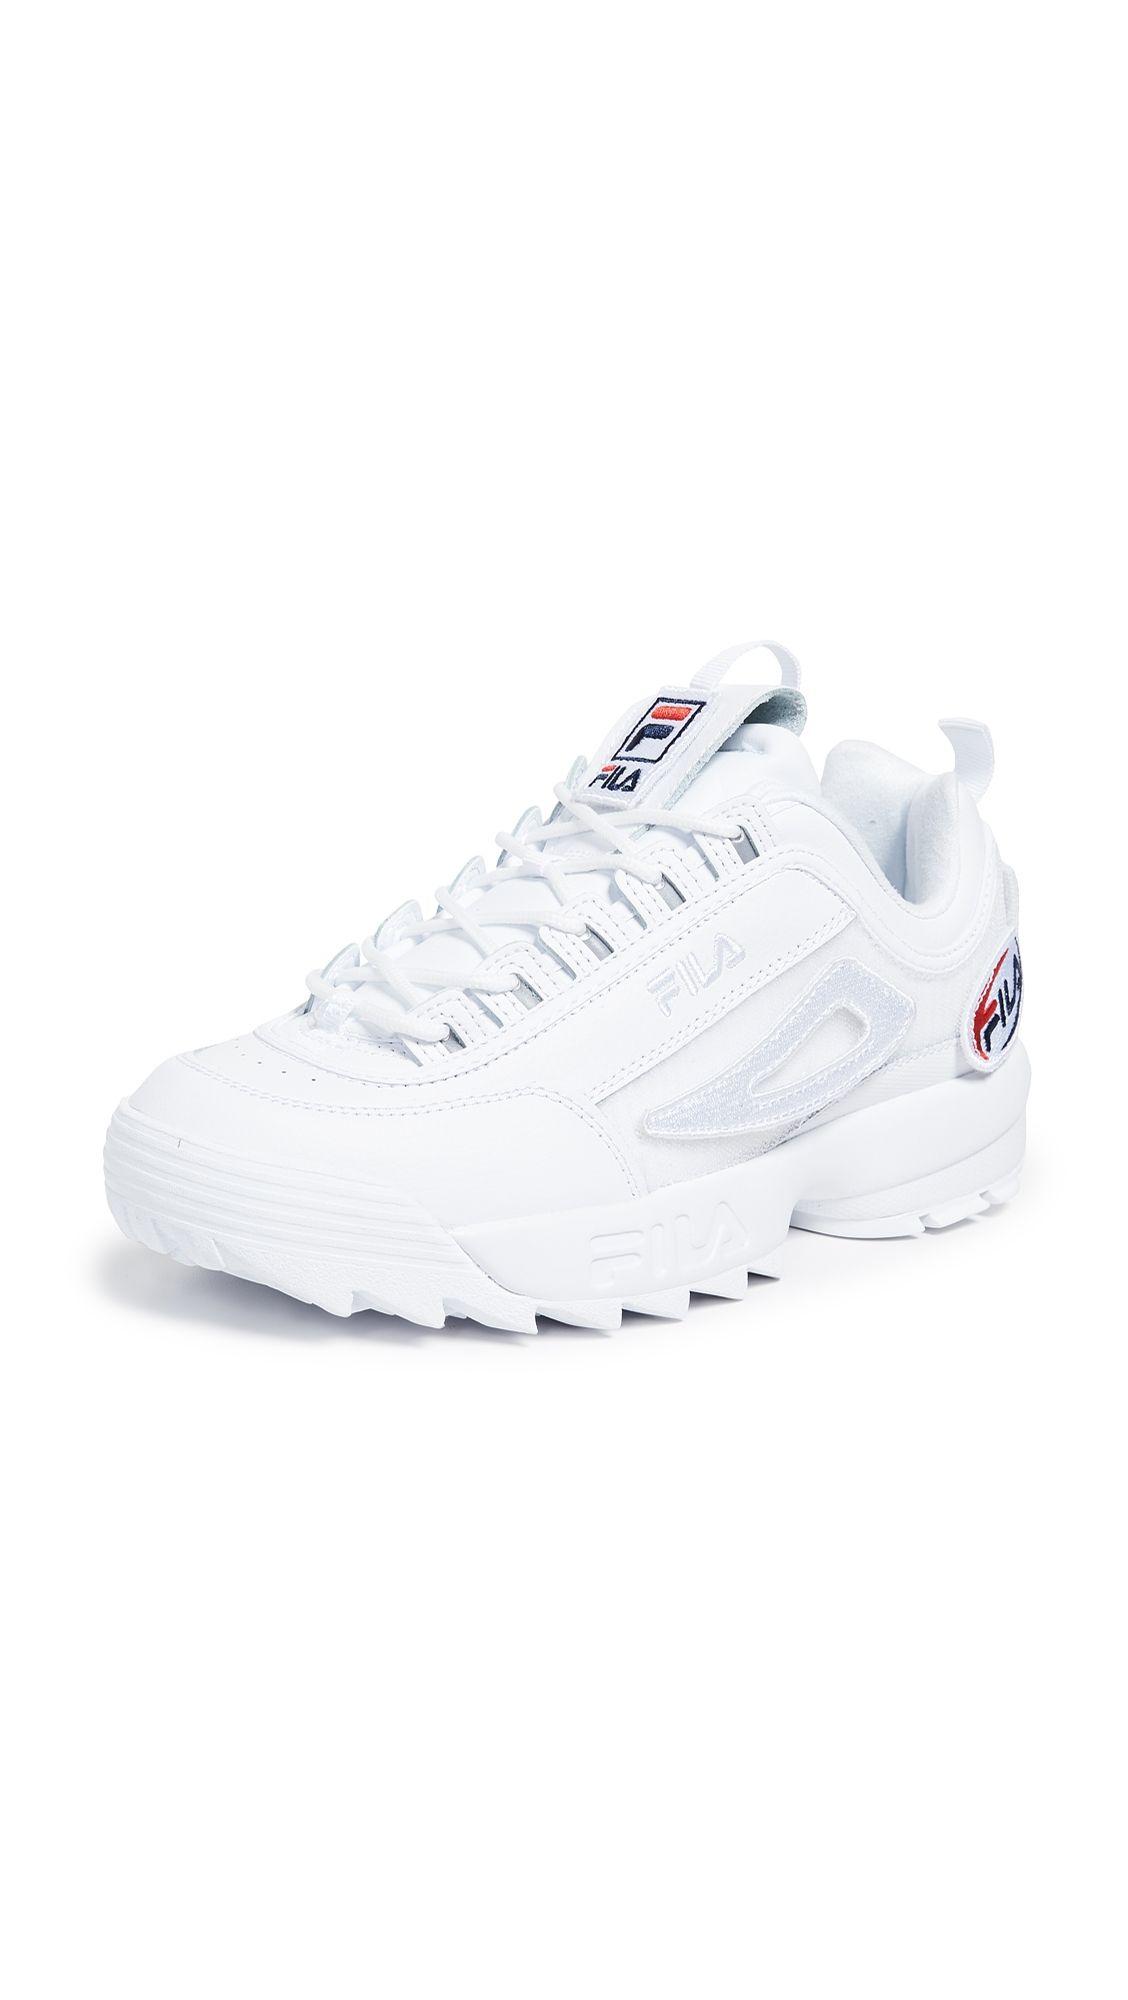 new concept 0e646 09ee2 FILA DISRUPTOR II CUSTOM PATCH SNEAKERS.  fila  shoes